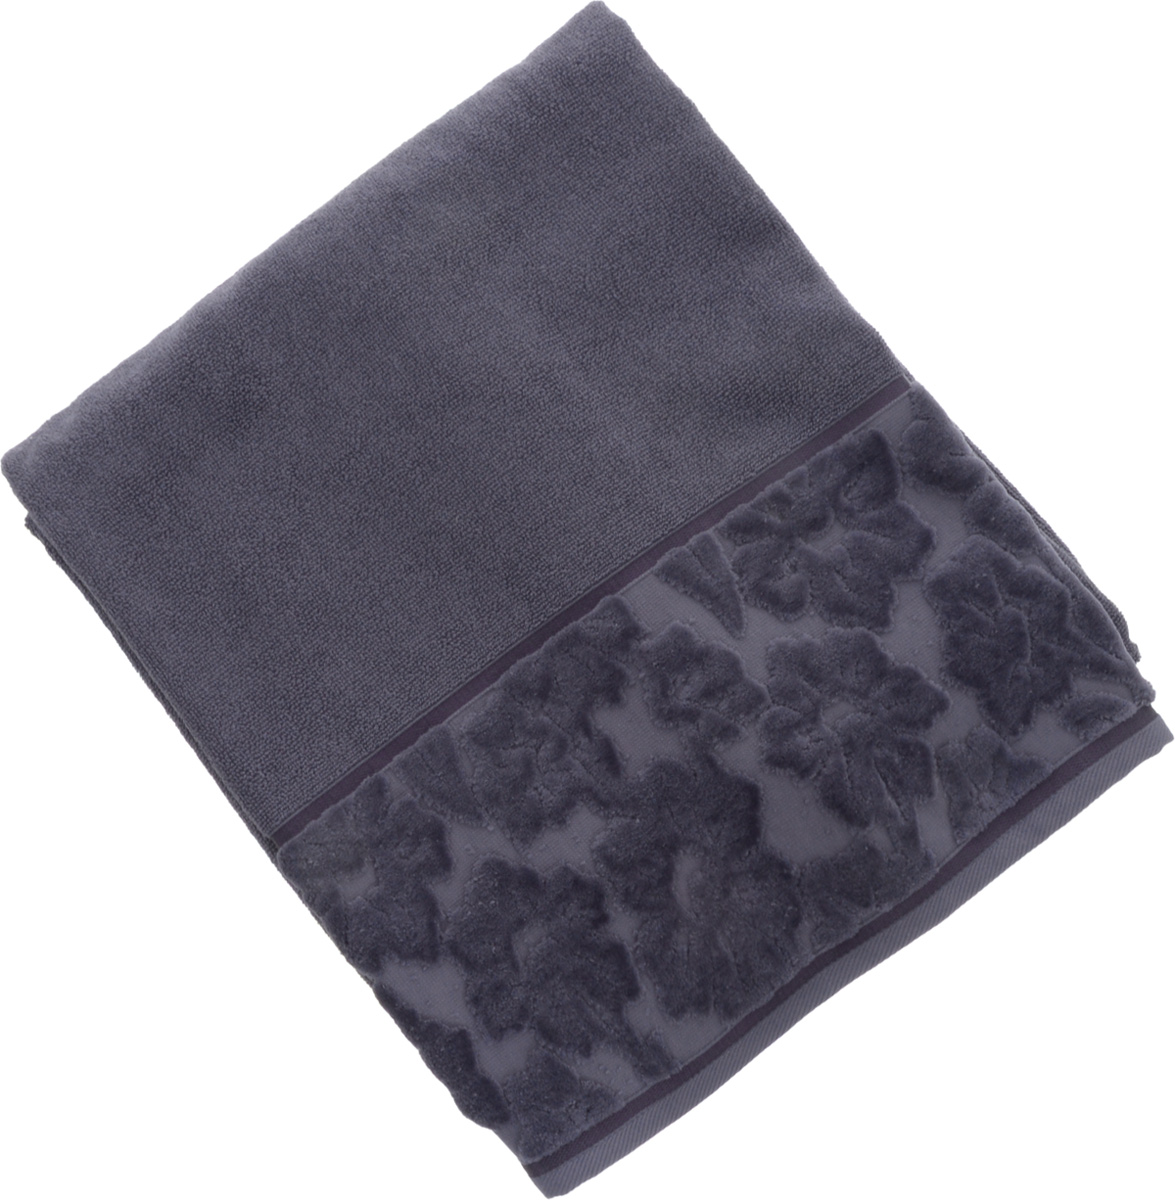 Полотенце махровое Issimo Home Jacquelyn, цвет: индиго, 70 x 140 см полотенце бамбуковое issimo home valencia цвет розовый 90 x 150 см